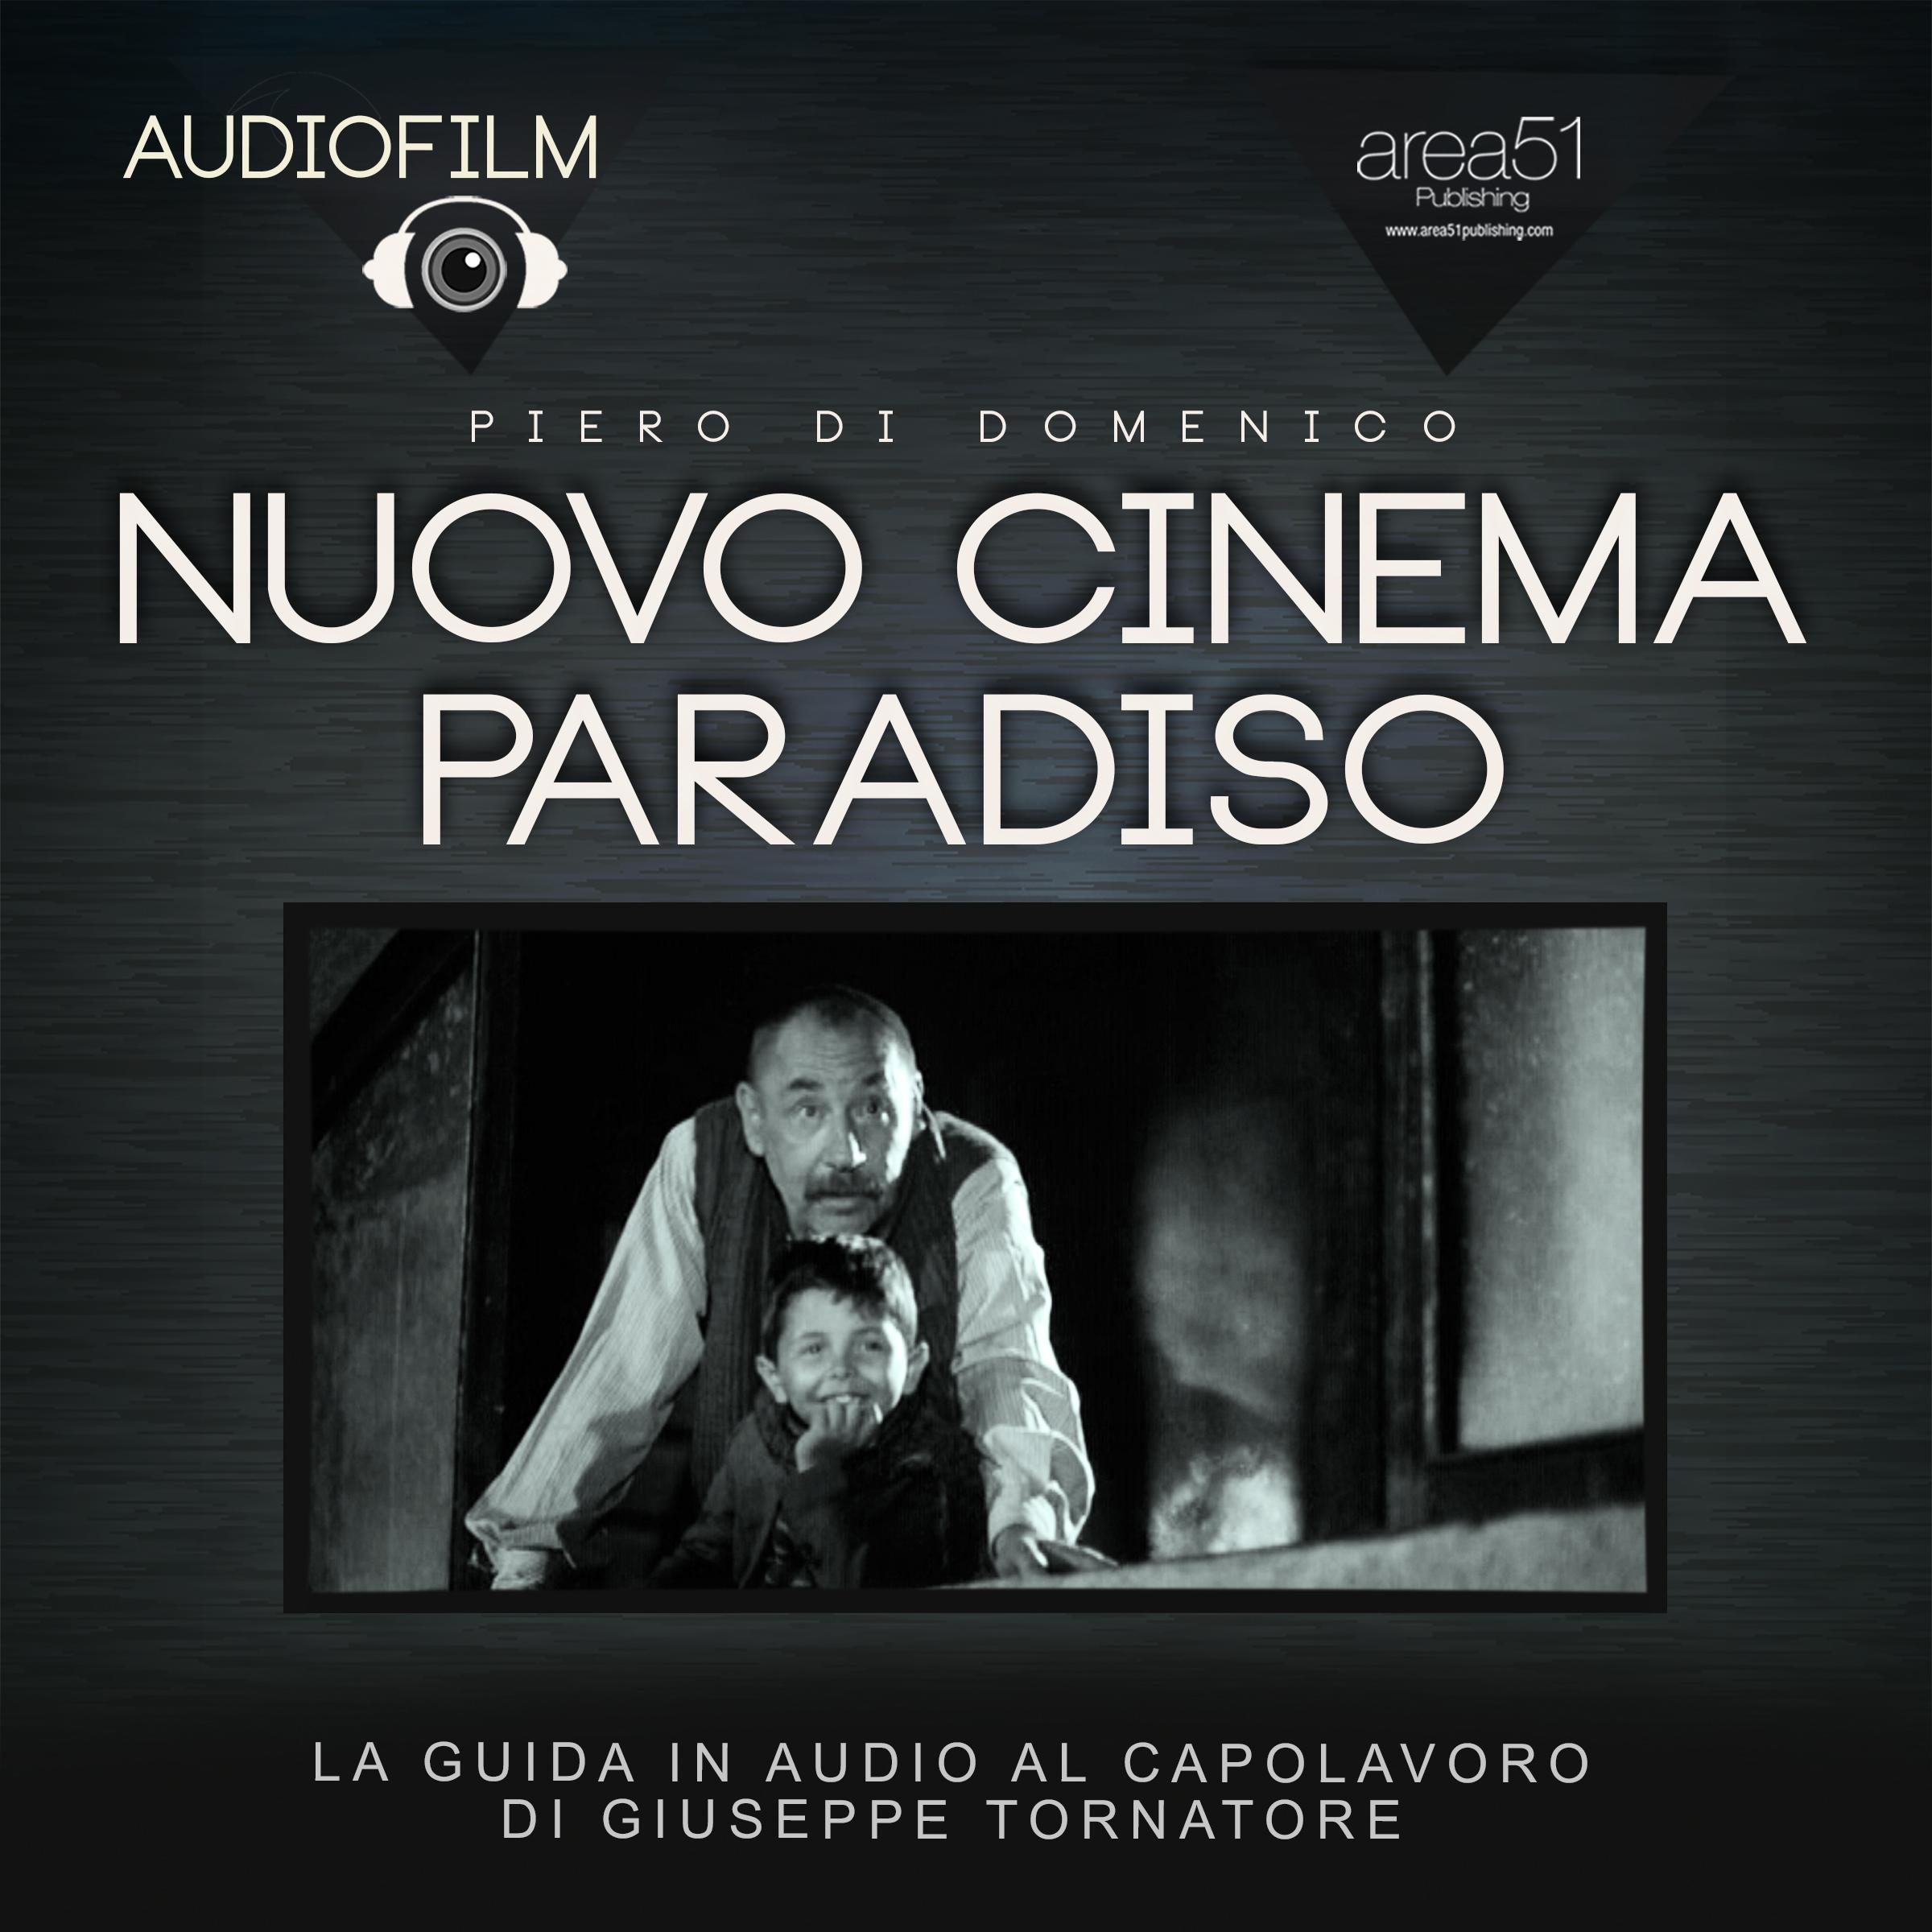 Nuovo Cinema Paradiso. Audiofilm-0